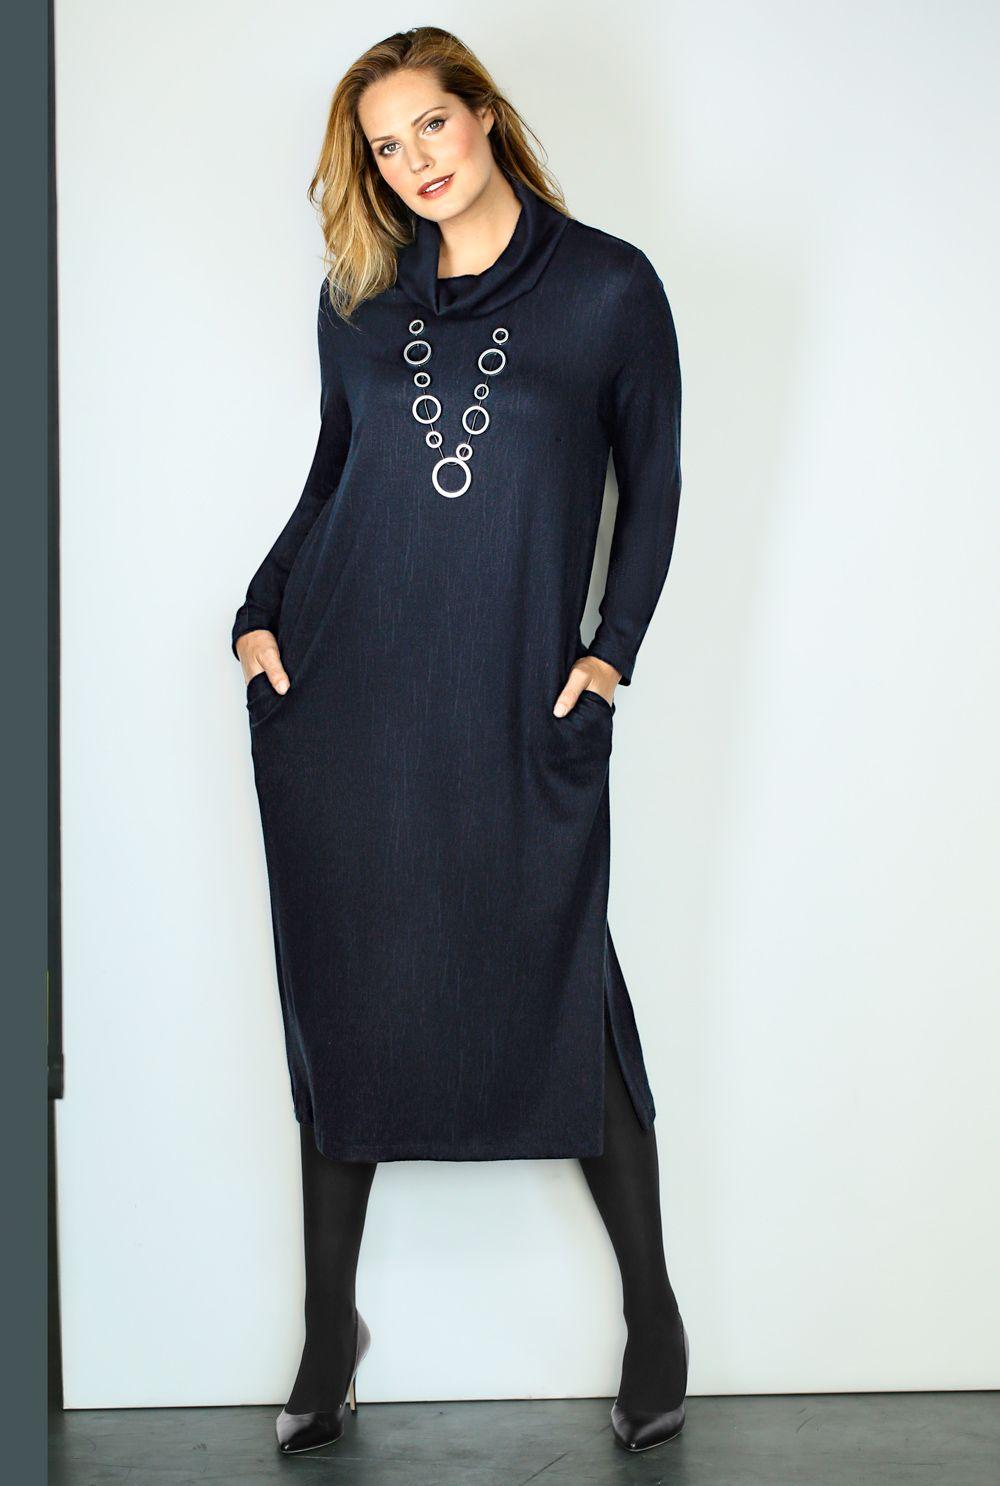 Jerseykleid, Rollkragen, A-Linie, selection | 71885870 ...